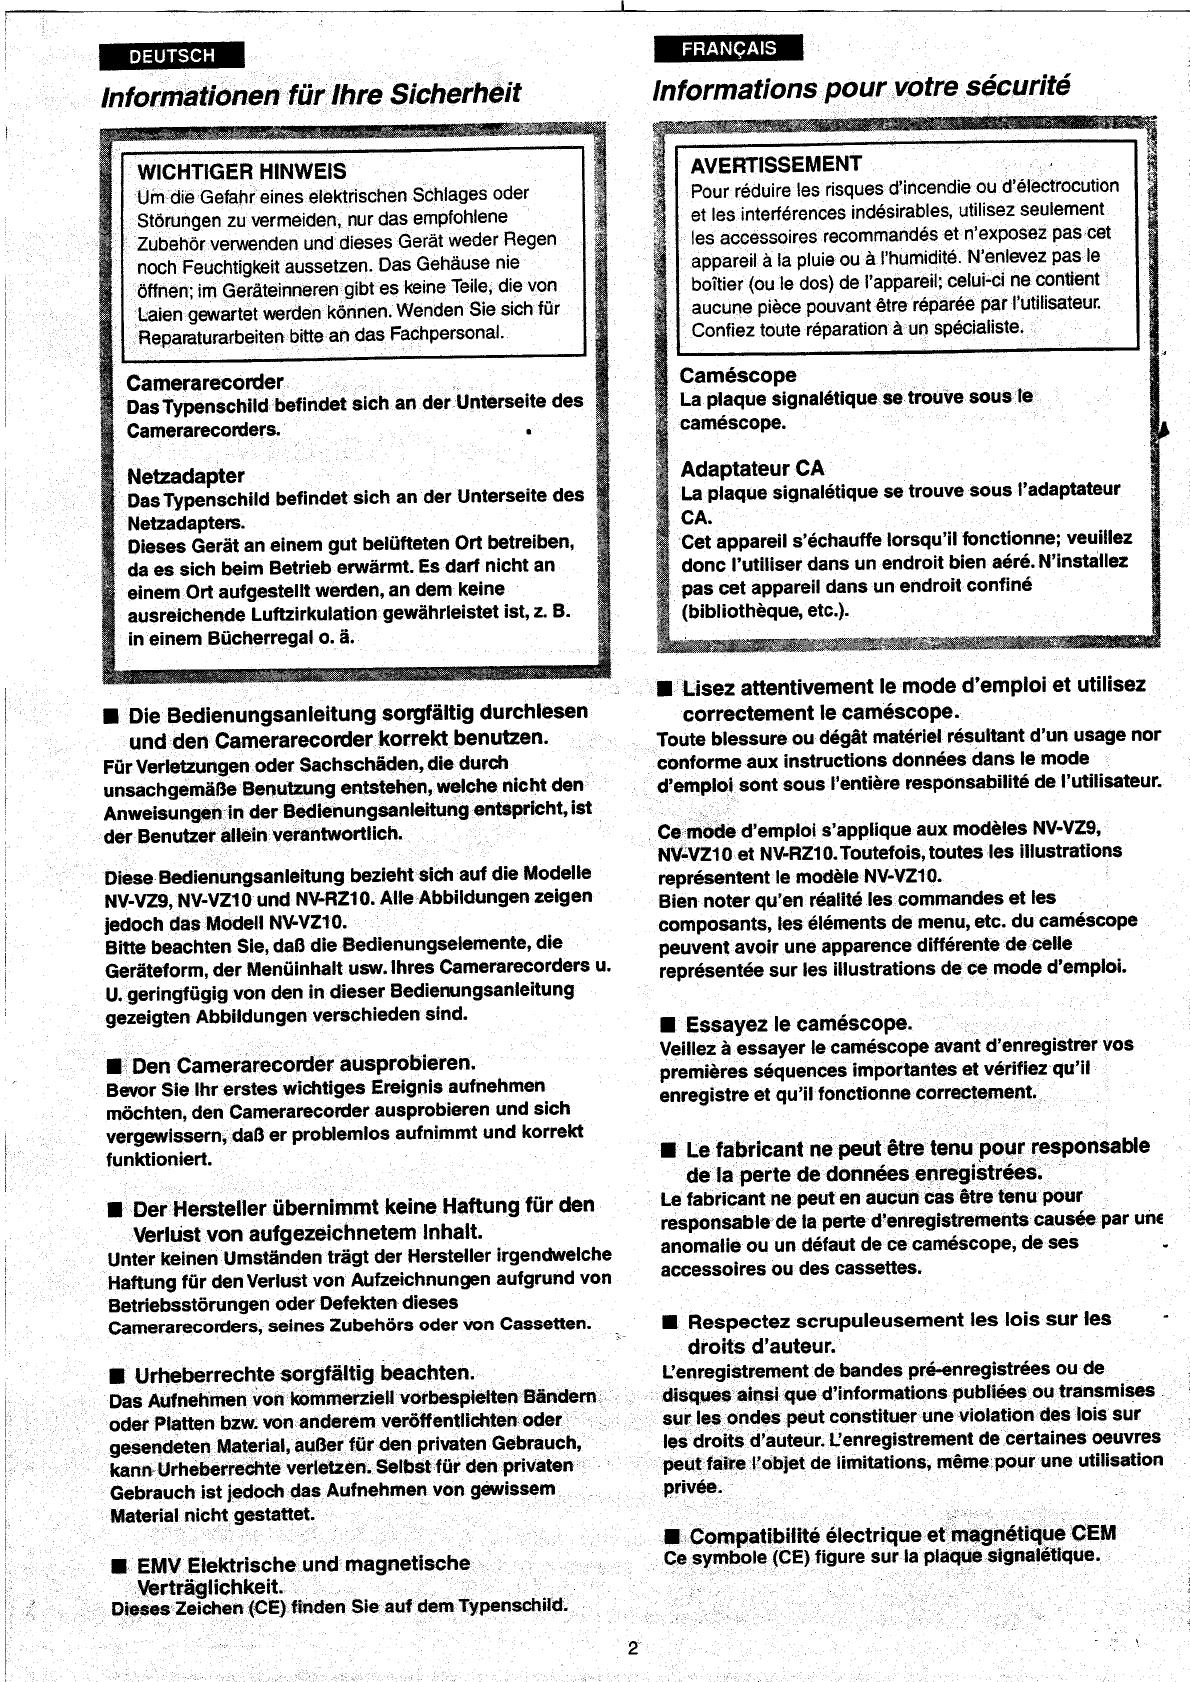 Appareil Magnétique Anti Humidité manual panasonic nv-rz10 (page 1 of 148) (german, french, dutch)